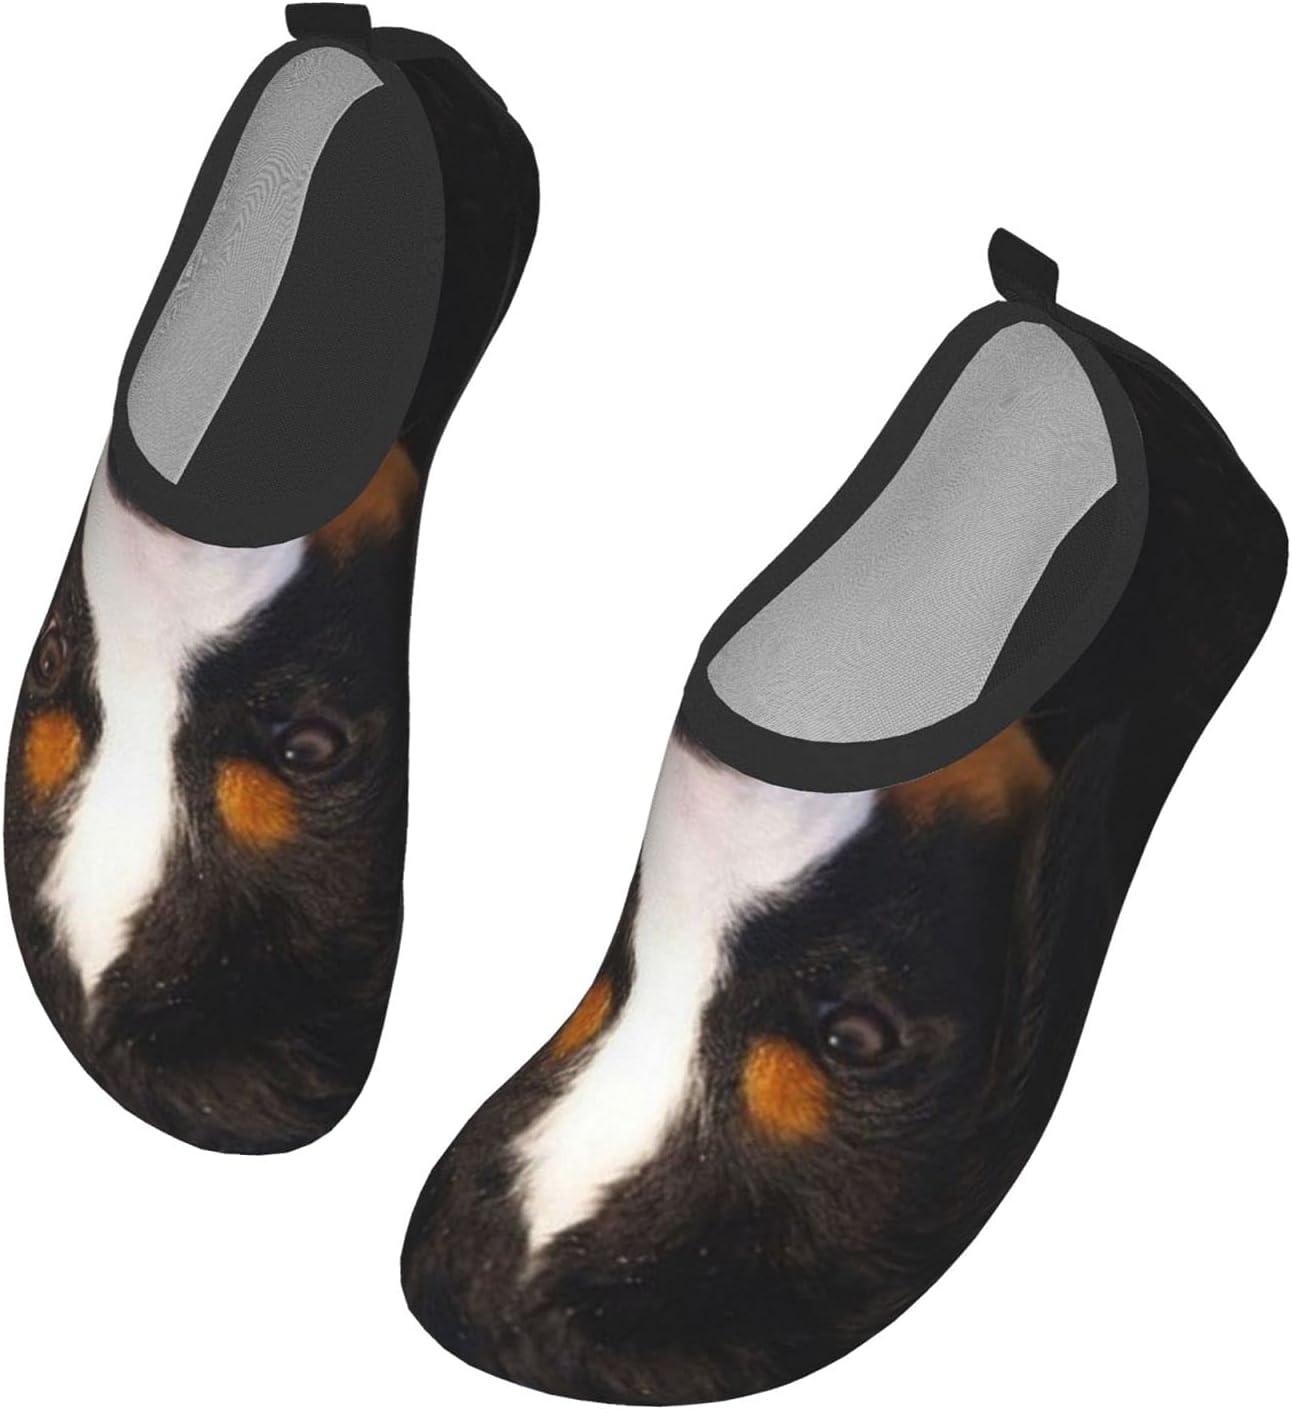 NA Bernese Mountain Dog Men's Women's Water Shoes Barefoot Quick Dry Slip-On Aqua Socks for Yoga Beach Sports Swim Surf